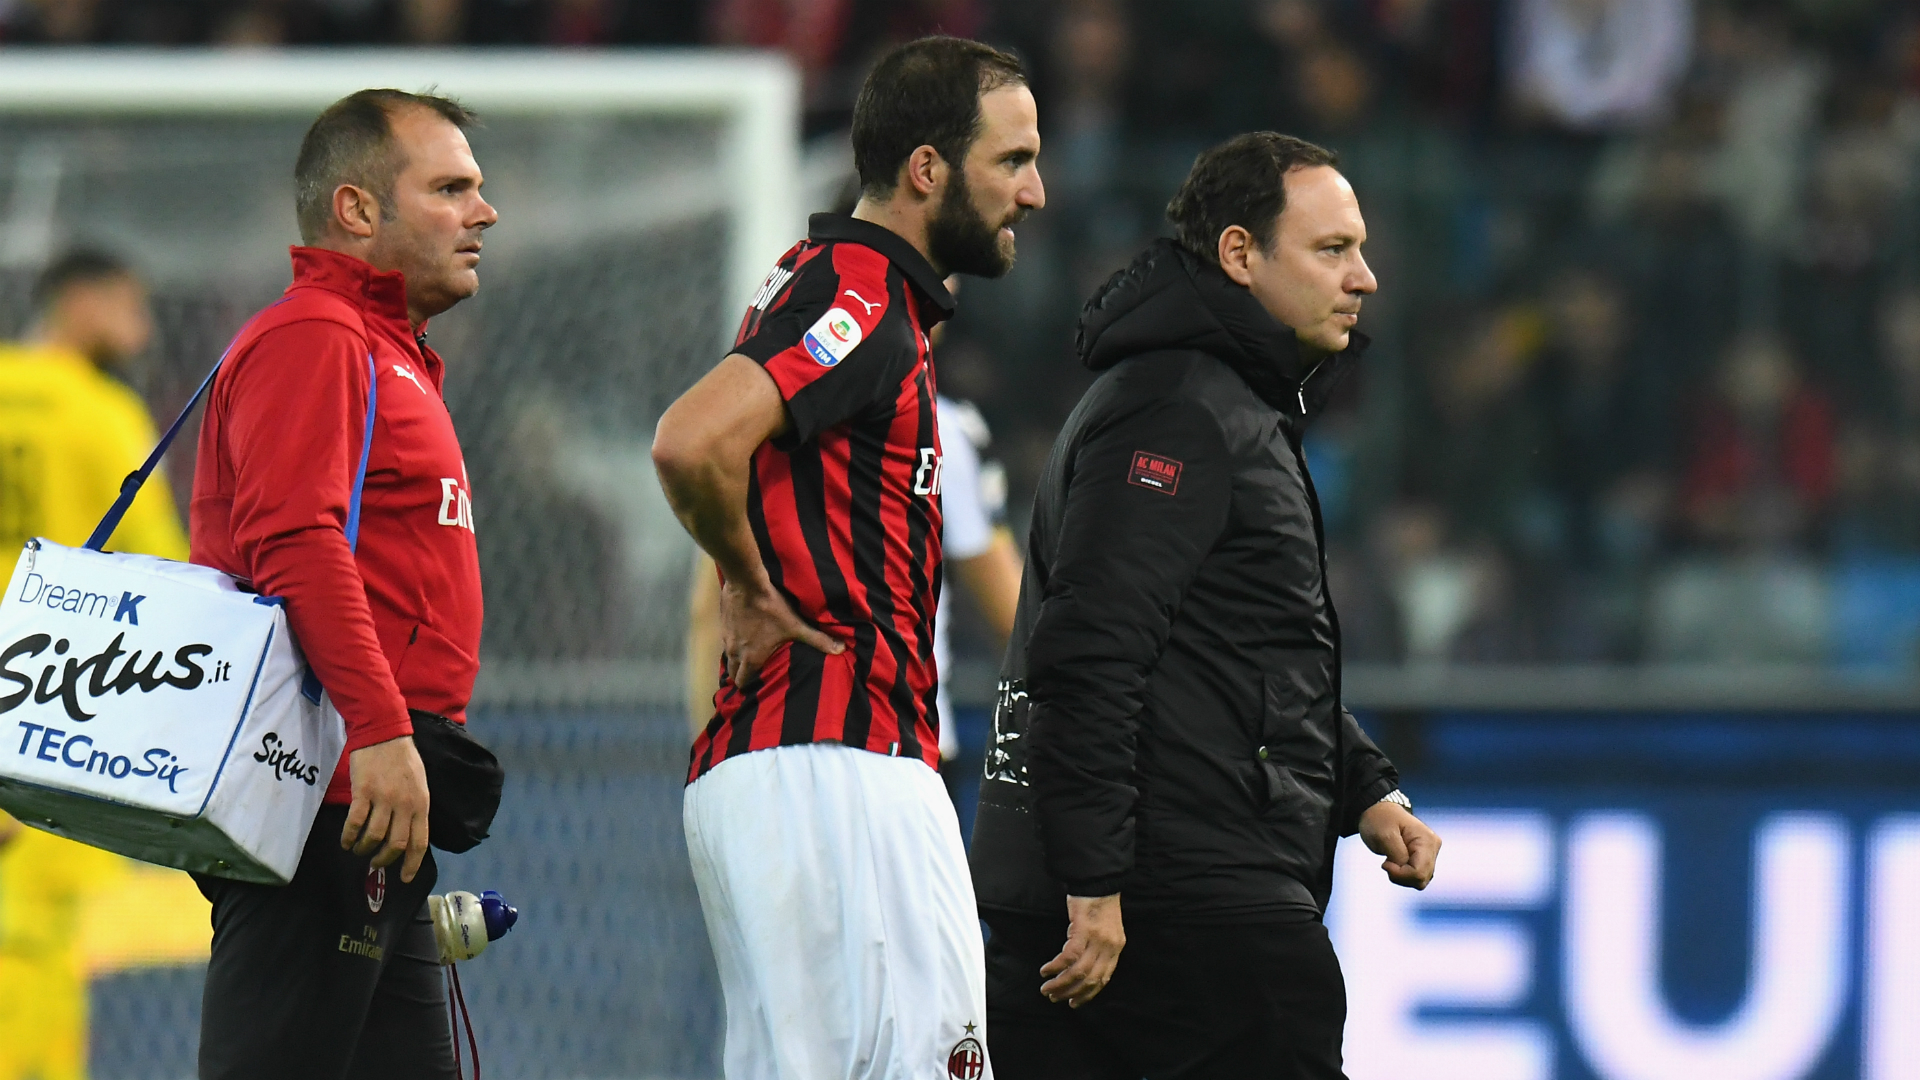 Gattuso berharap untuk berita positif pada Higuain jelang pertandingan Juventus